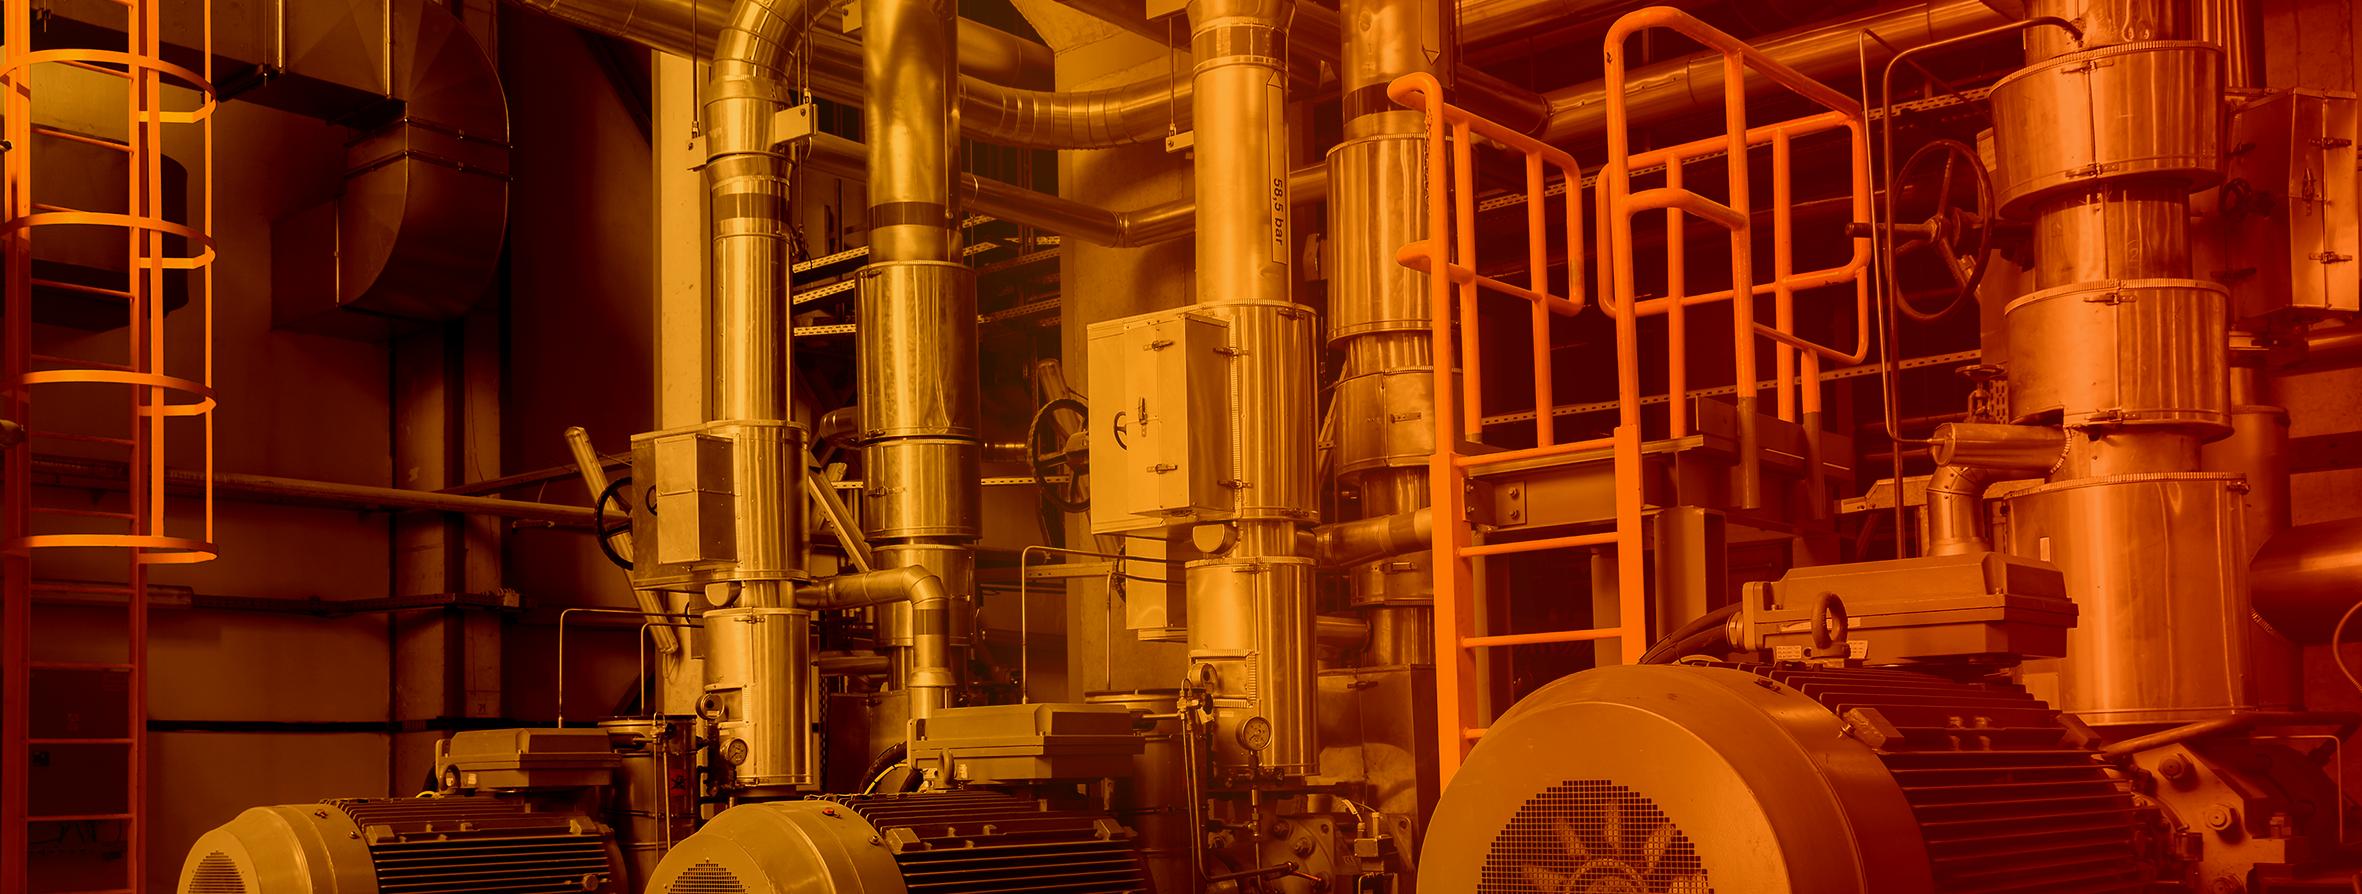 "LLC ""Kramatorskteploenergo"" is the leading heat supply company in the city of Kramatorsk"